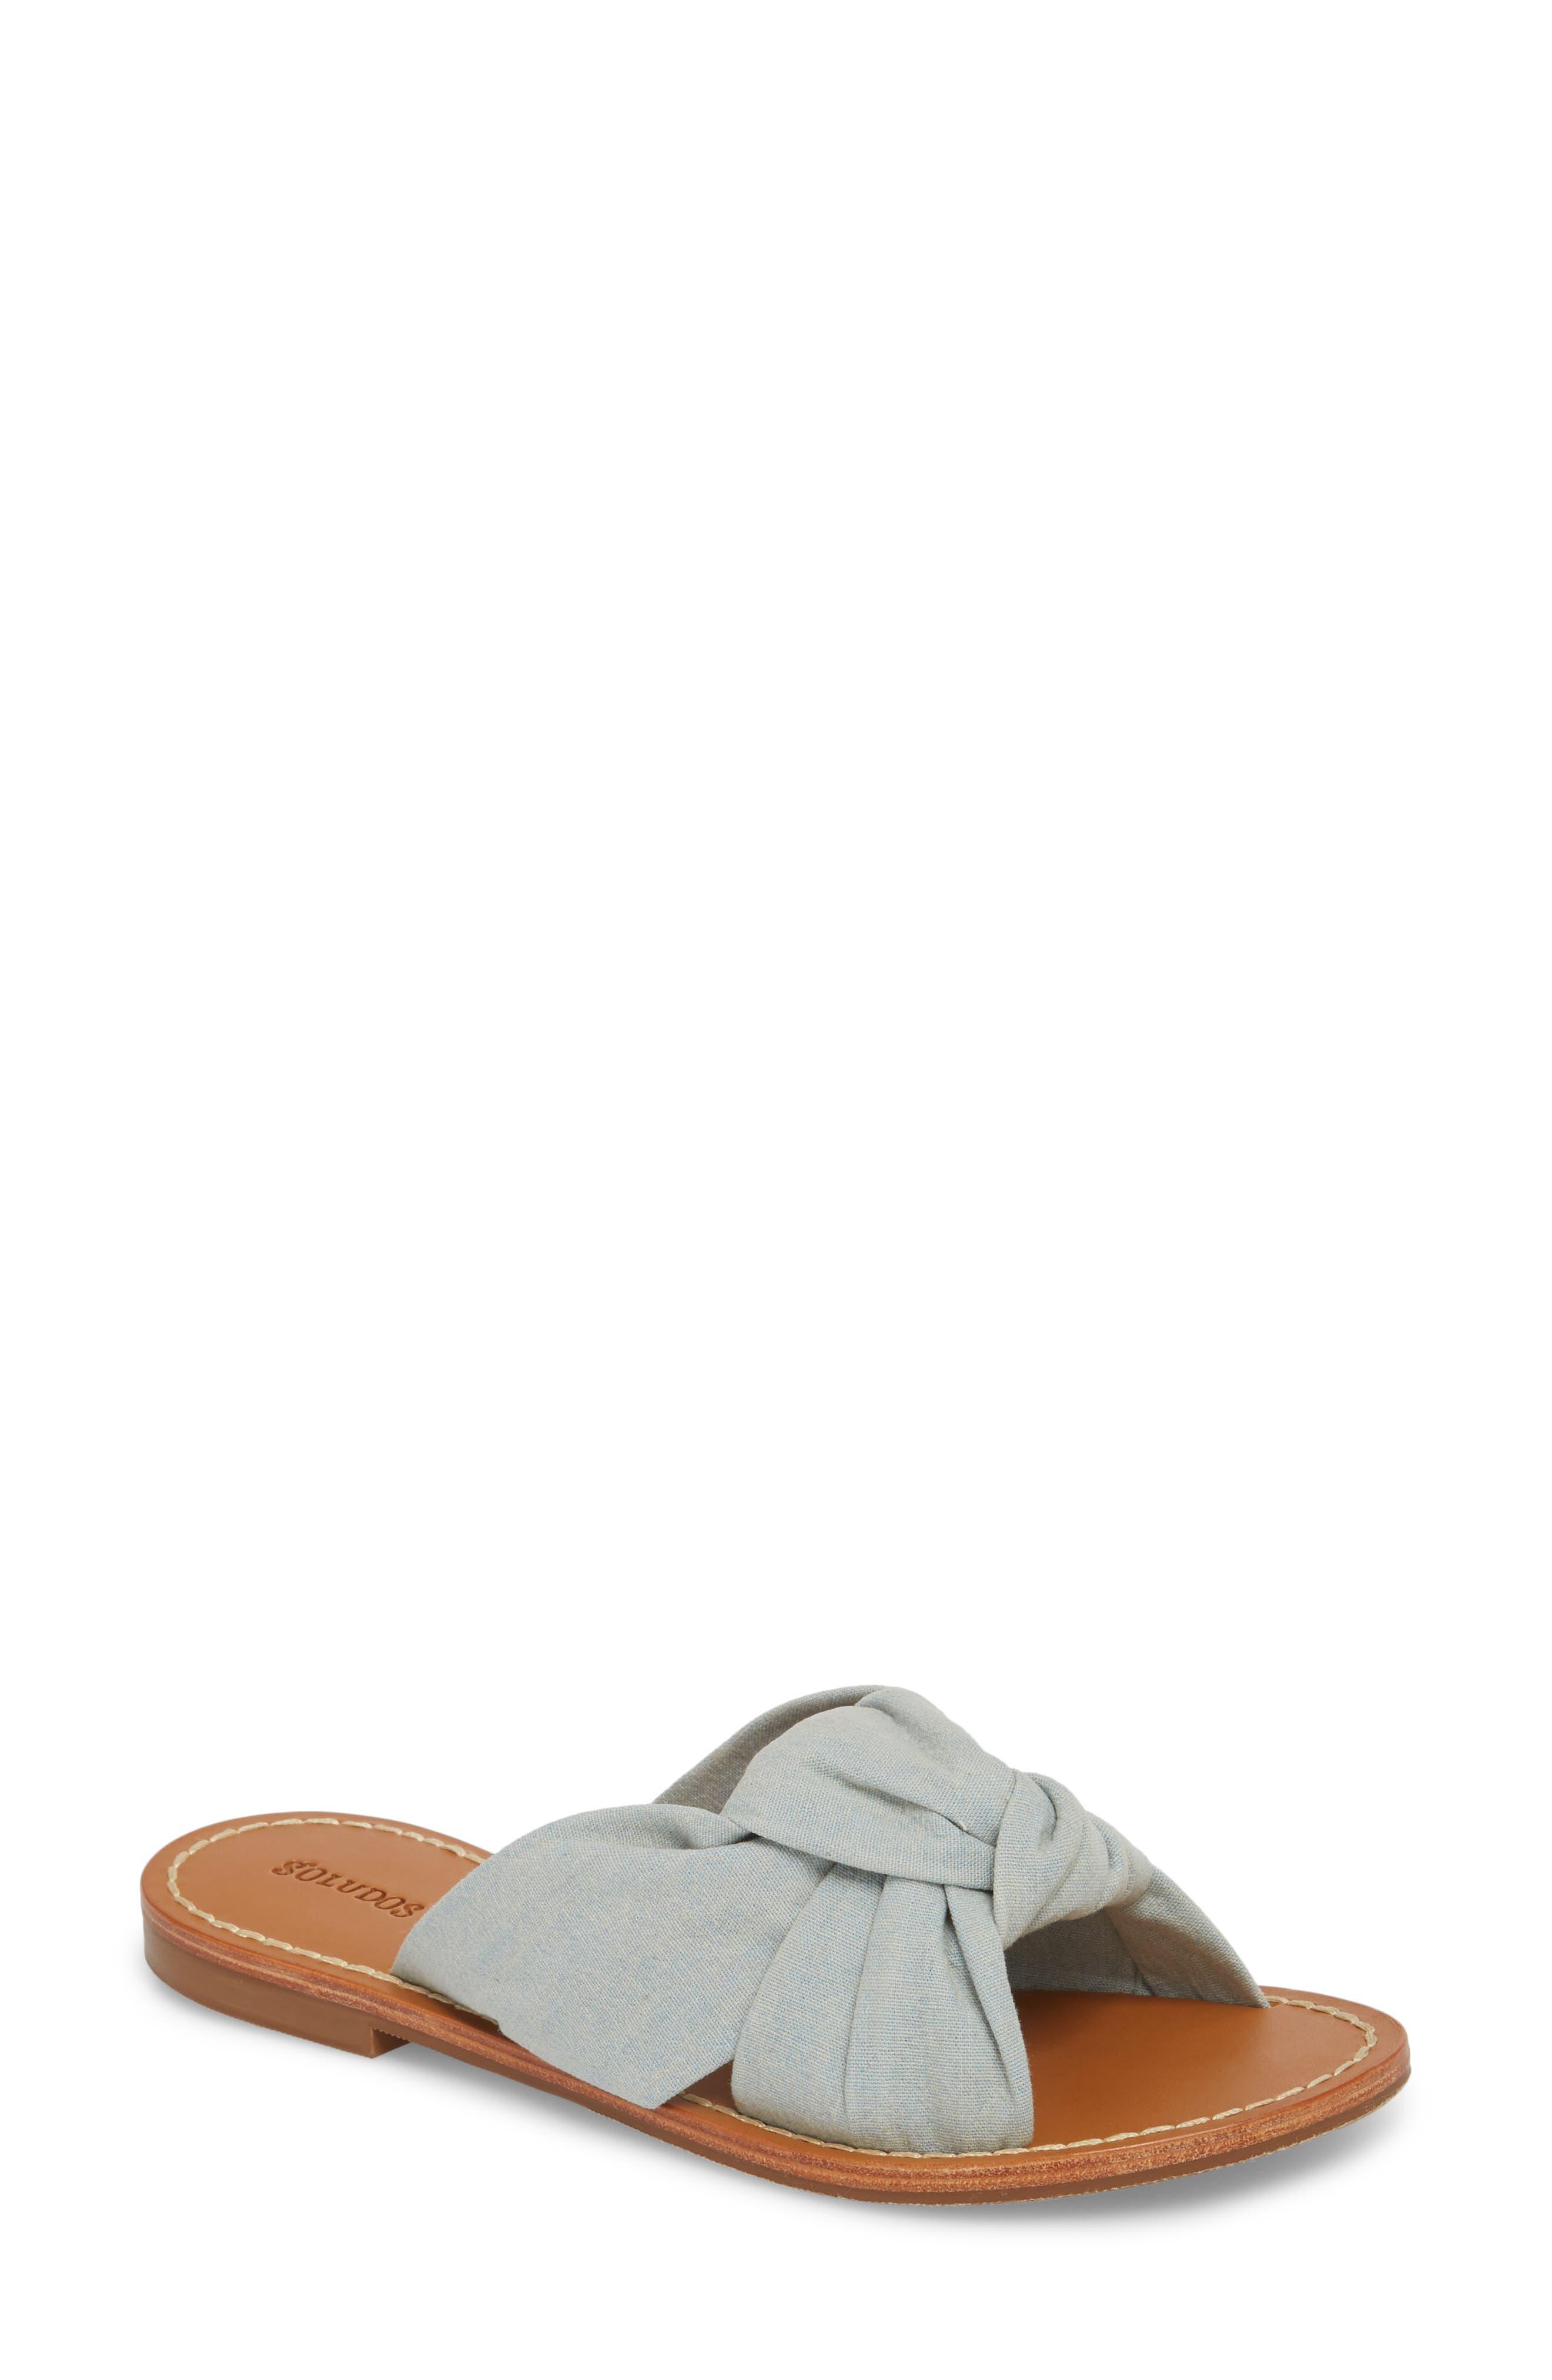 Knotted Slide Sandal,                             Main thumbnail 1, color,                             Chambray